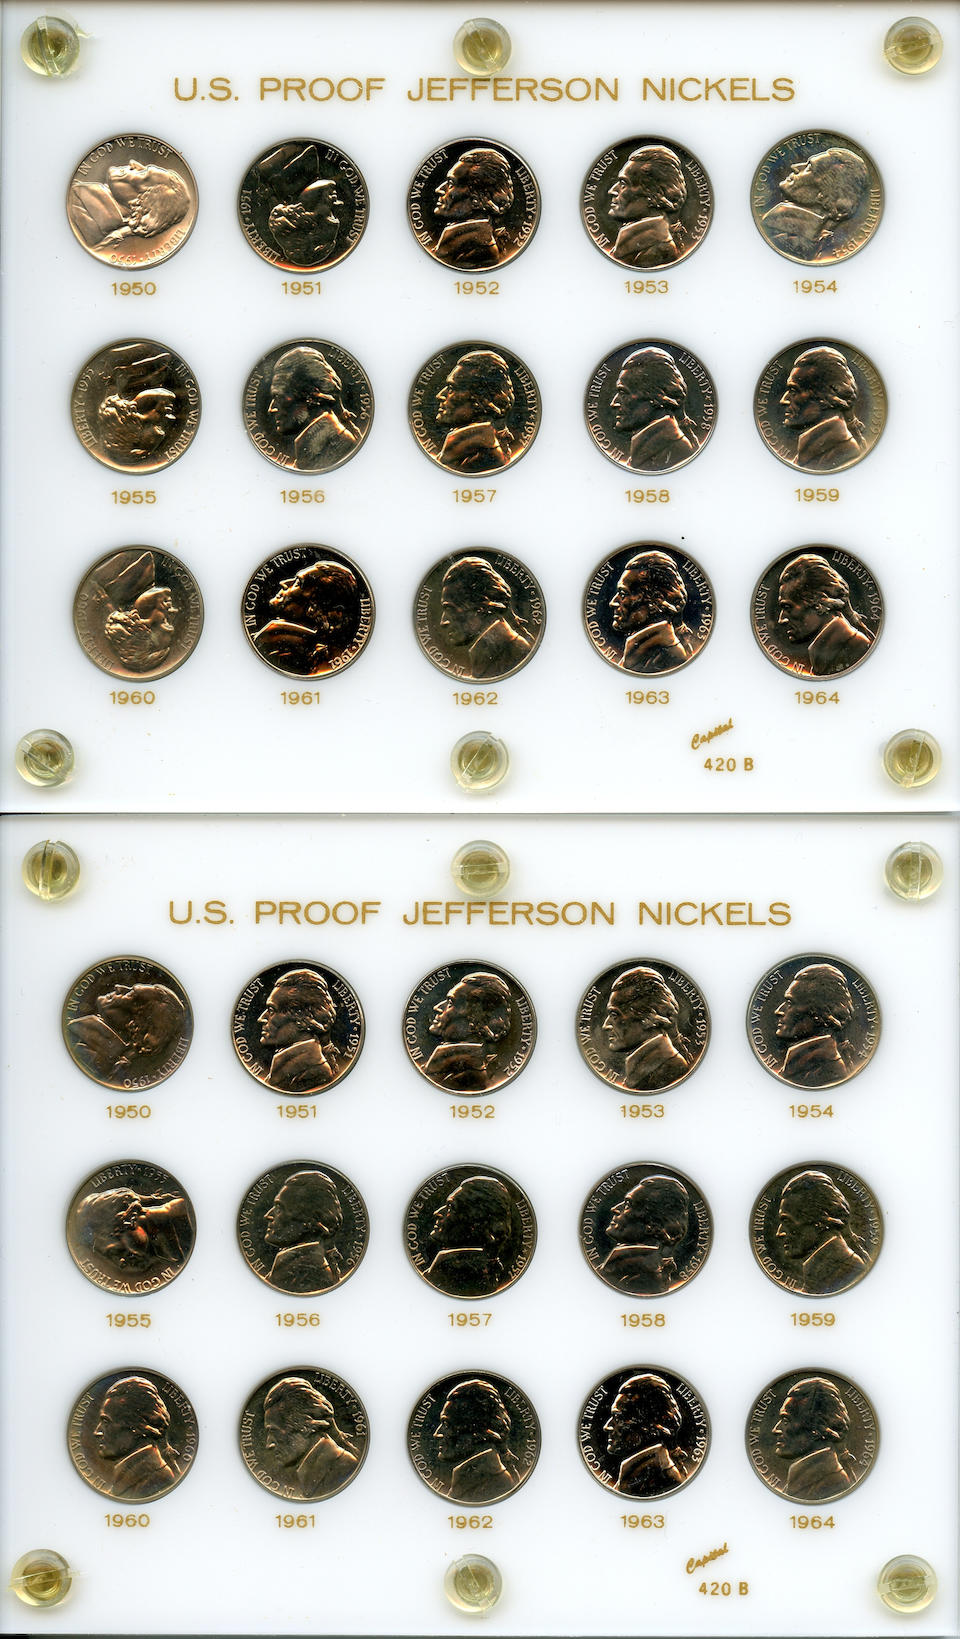 Proof Jefferson Nickel Sets, 1950-1964 (5)